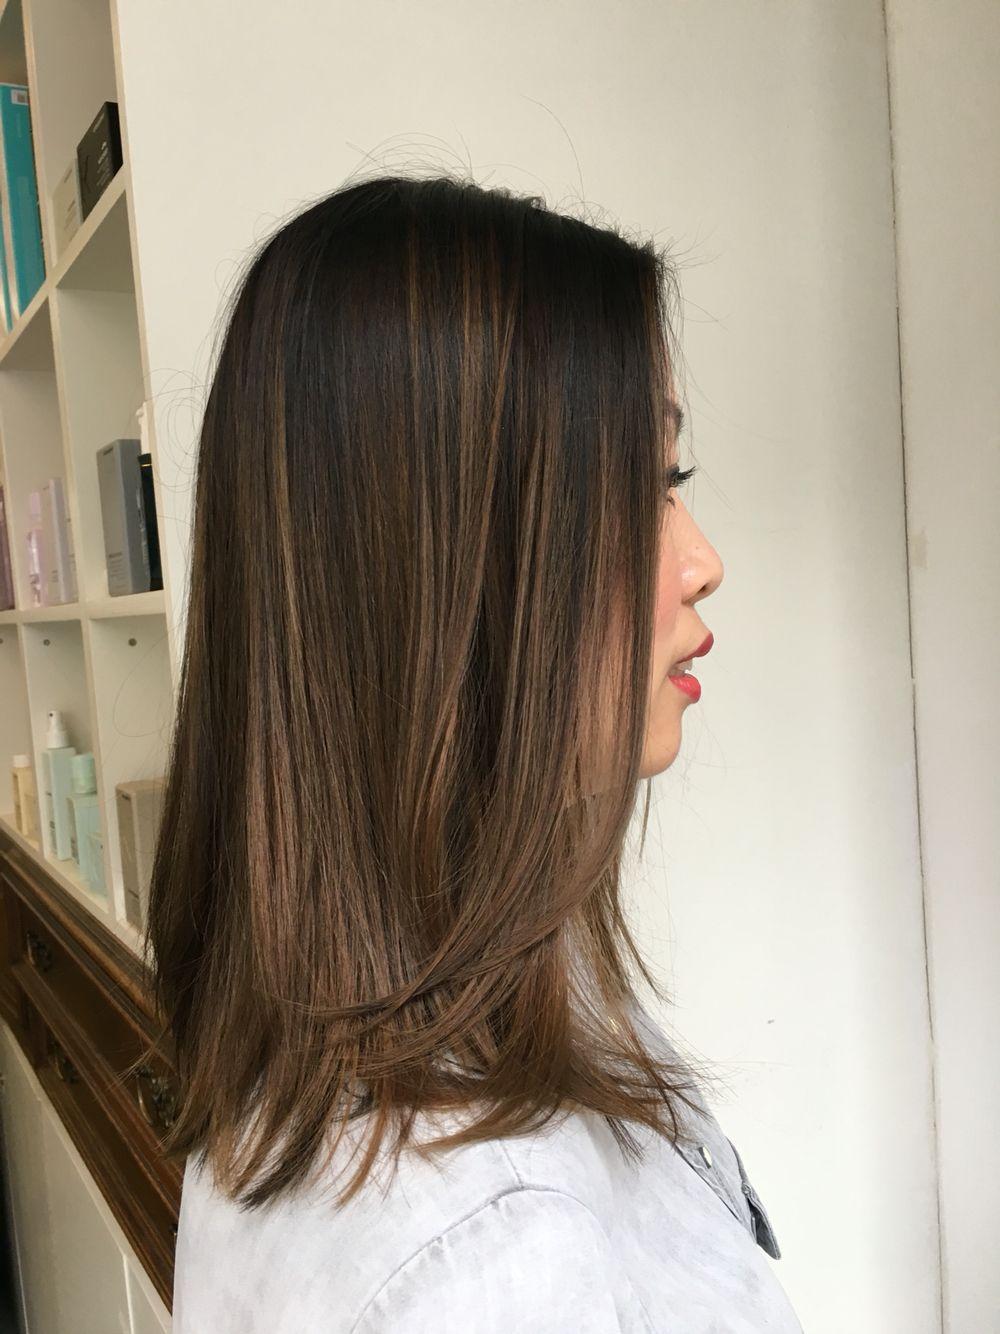 Follow Me On Instagram For More Of My Work Missmary 79 Balayage Balayagehighlights Hair Haircolor A Balayage Straight Hair Hair Color Asian Balayage Hair